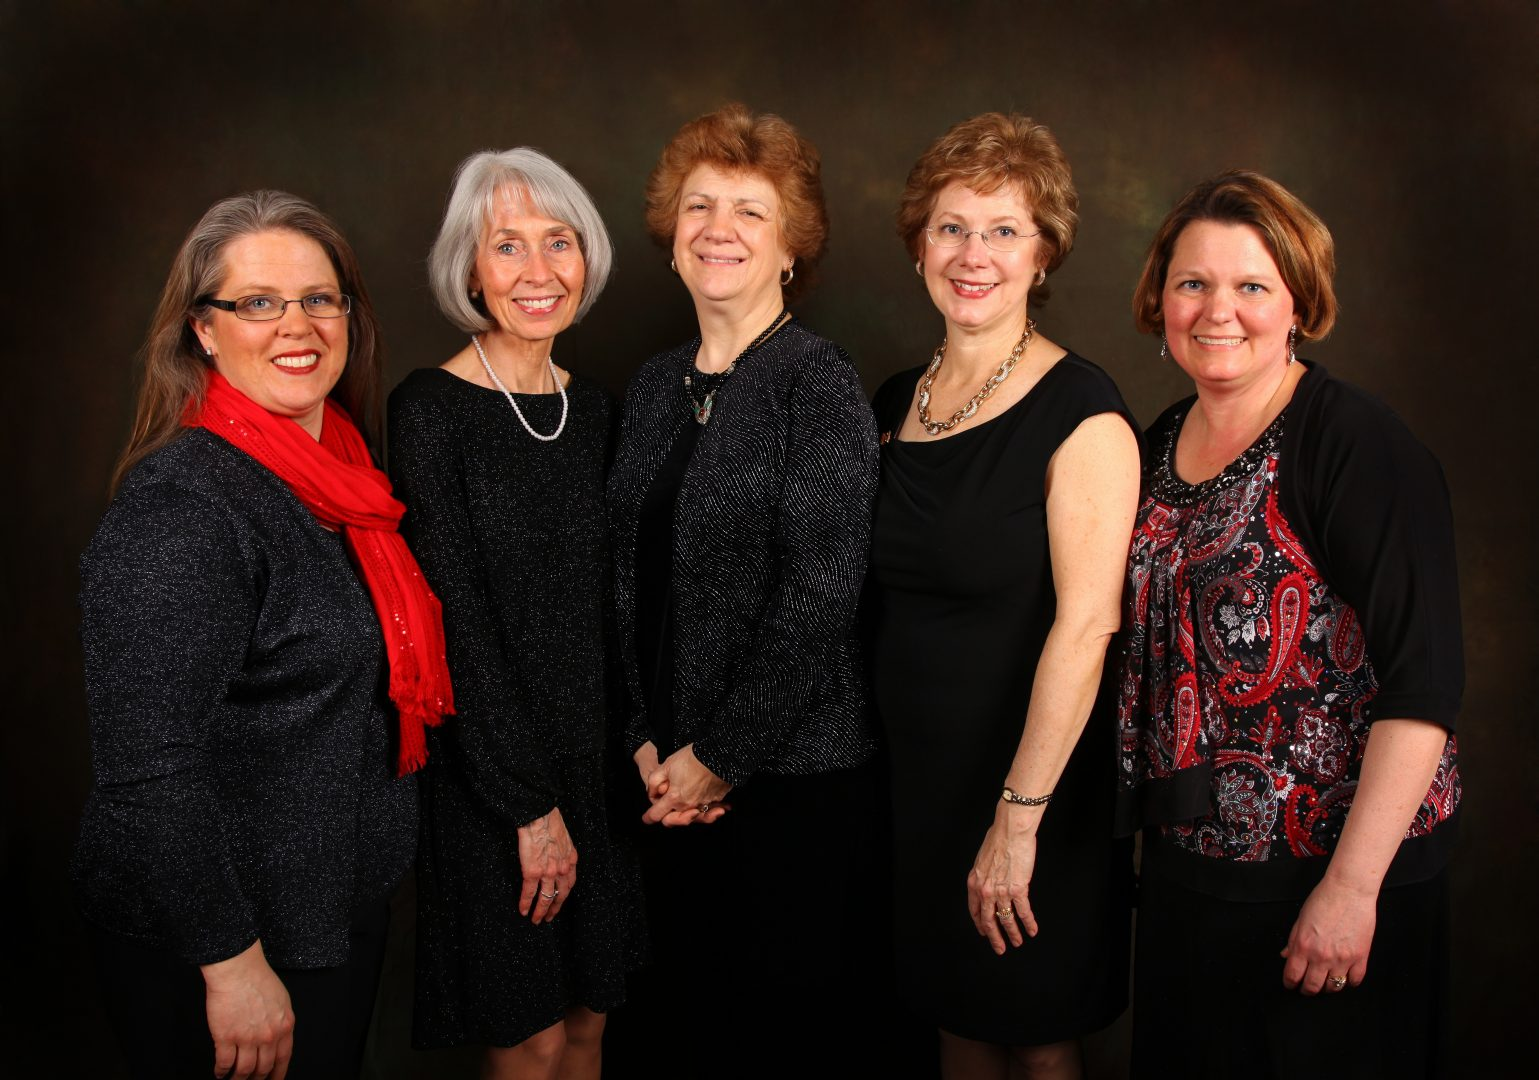 EYC Artistic Staff (2008-2014) from left Ann Tucker, Karen Snodgrass, JoAnn Black, Beverly Taylor, Kim Scherrer